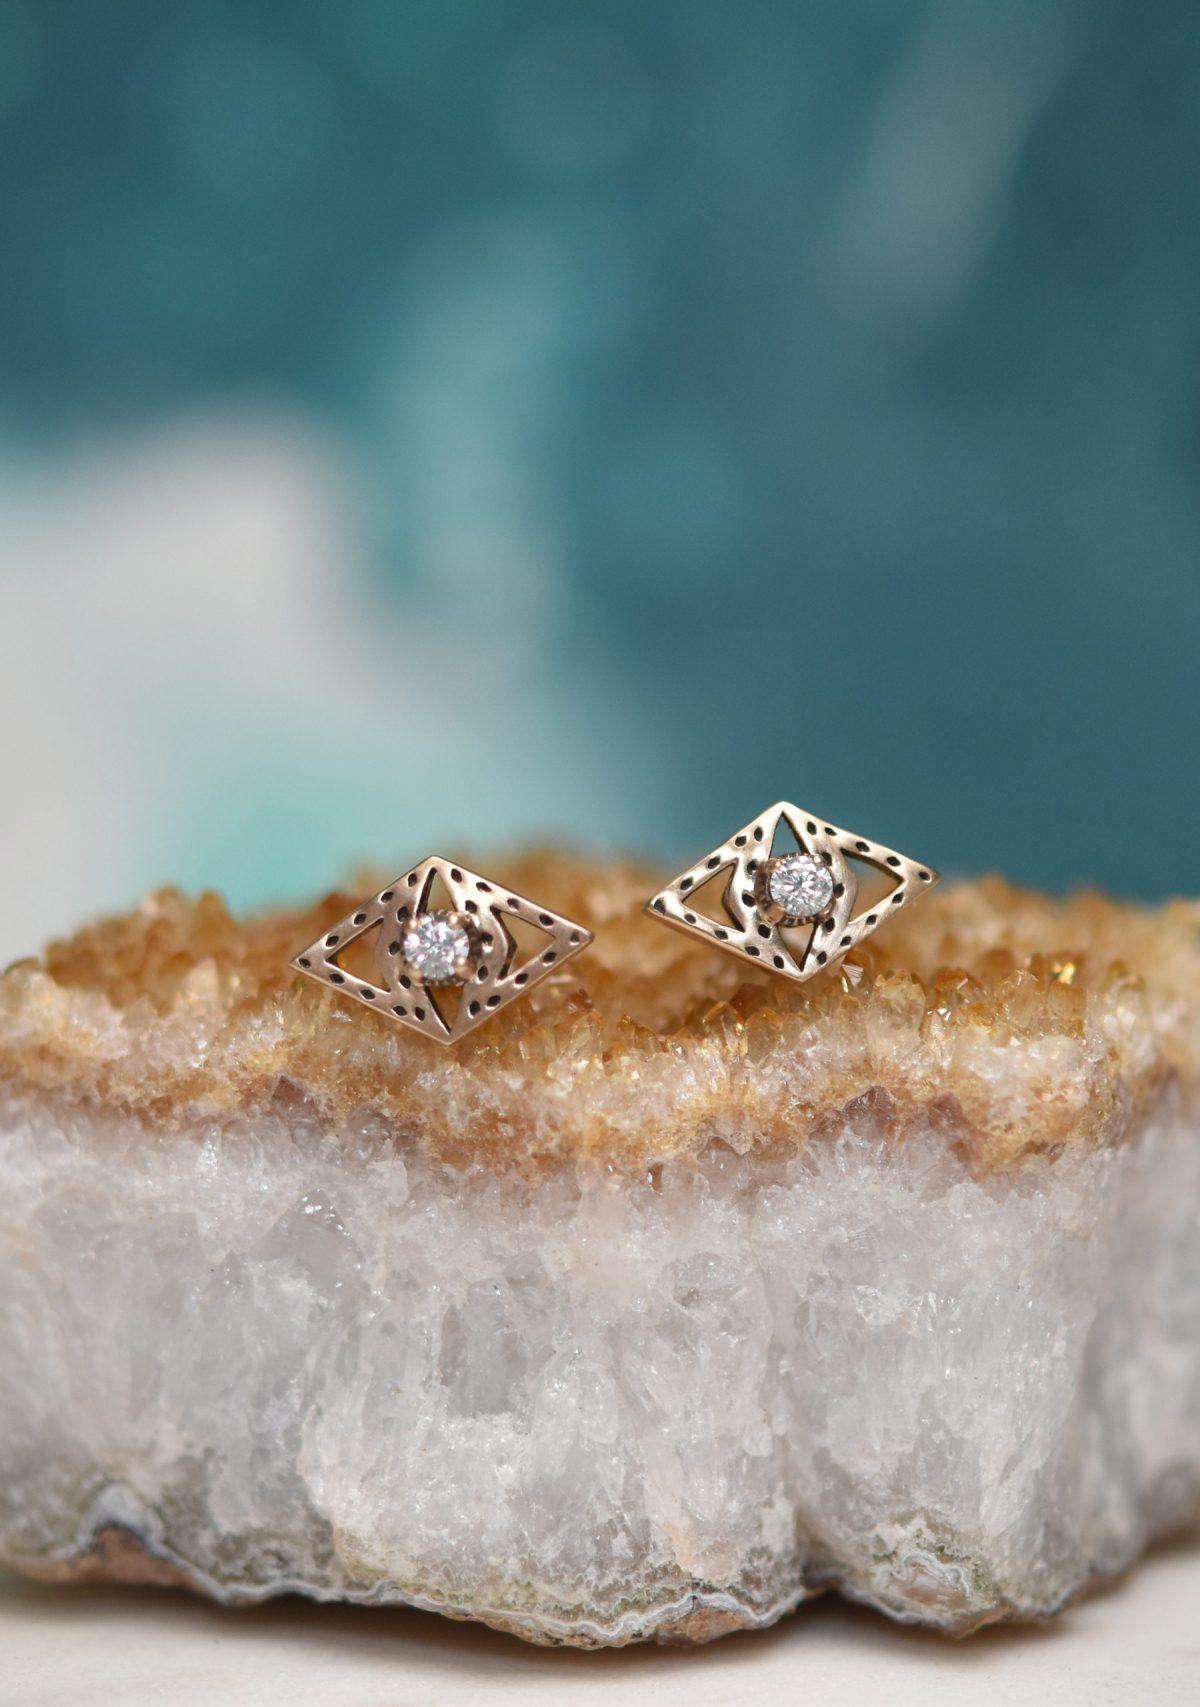 Saint K 10k Gold Stud Diamond Earrings